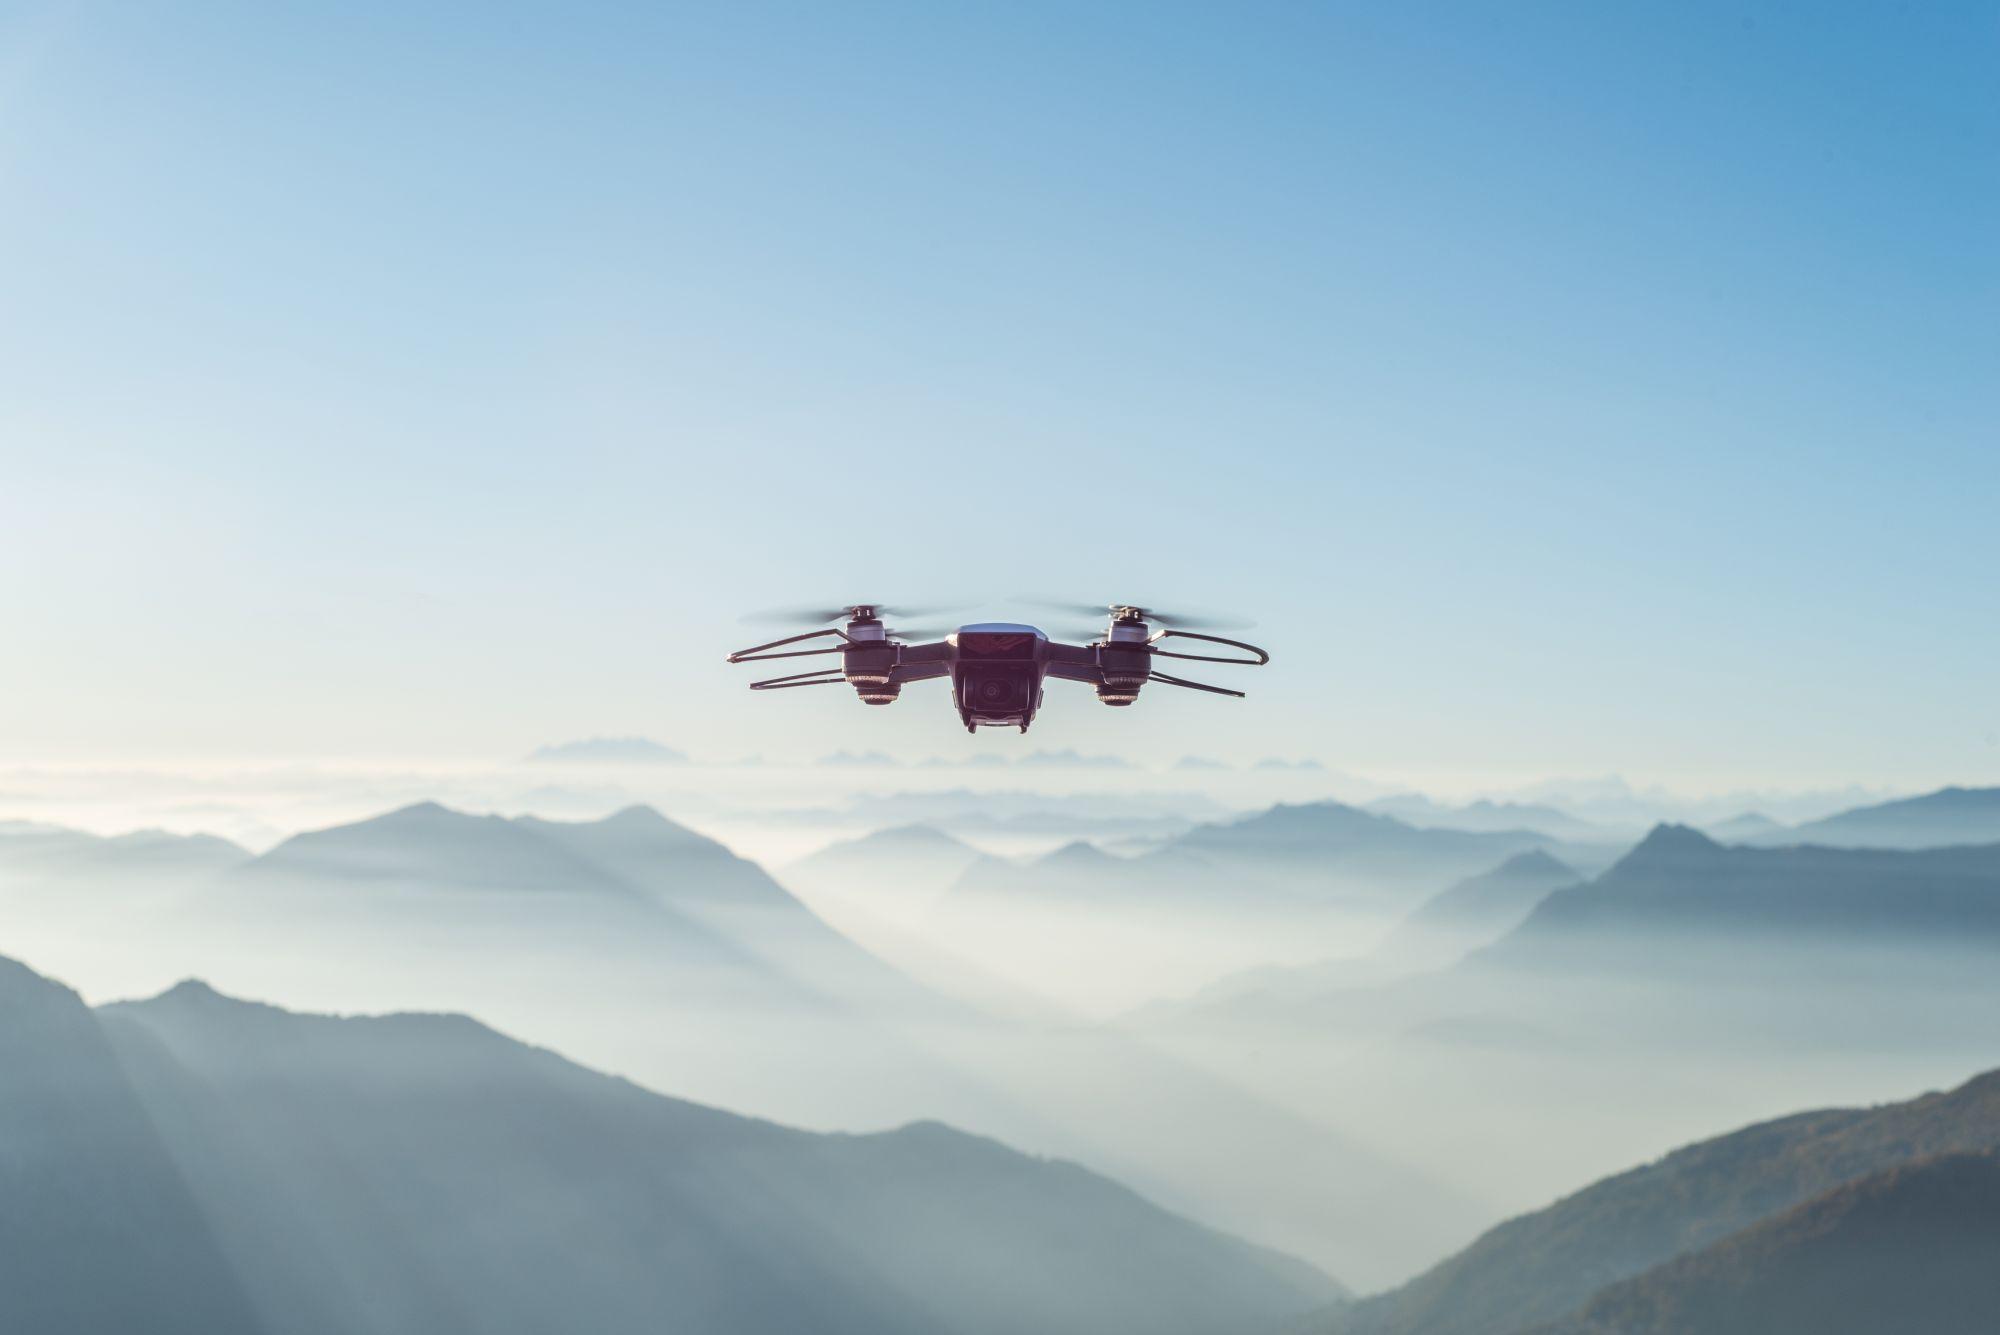 Drón repül a hegyek felett